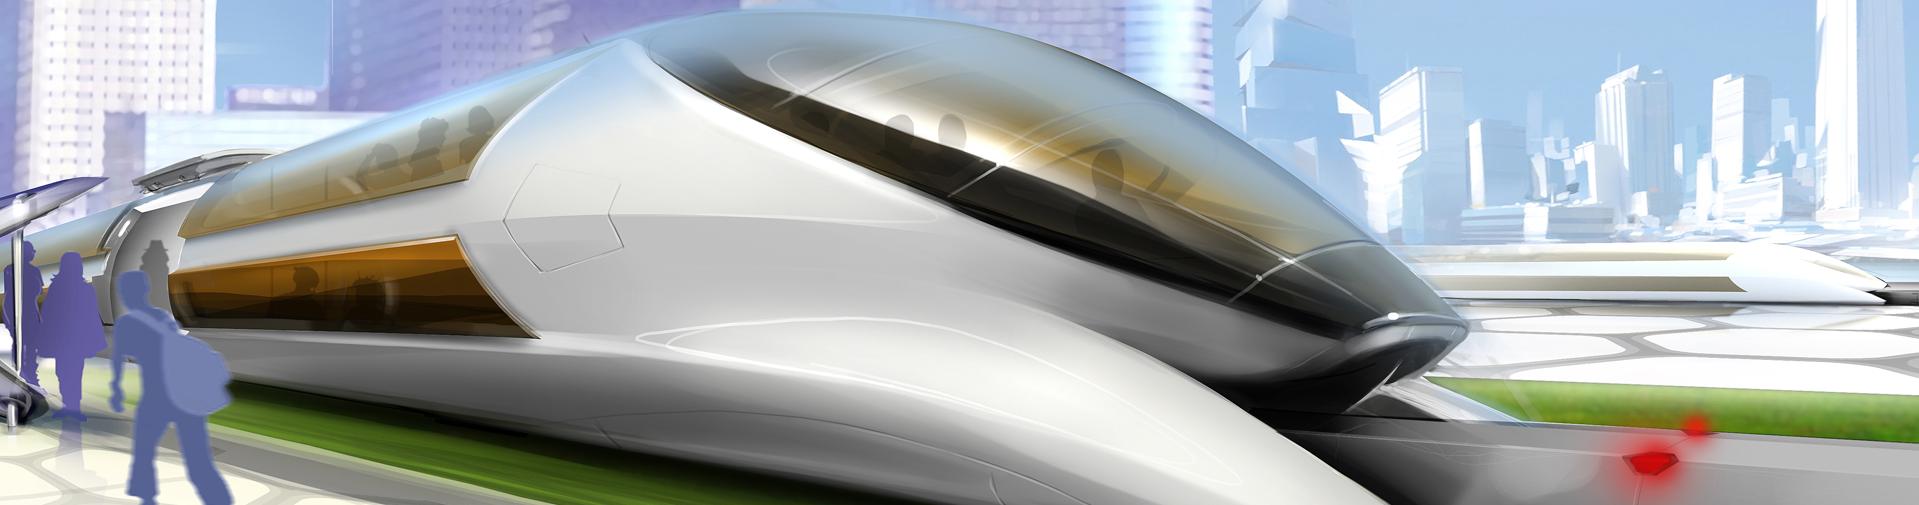 transport Aerotrain